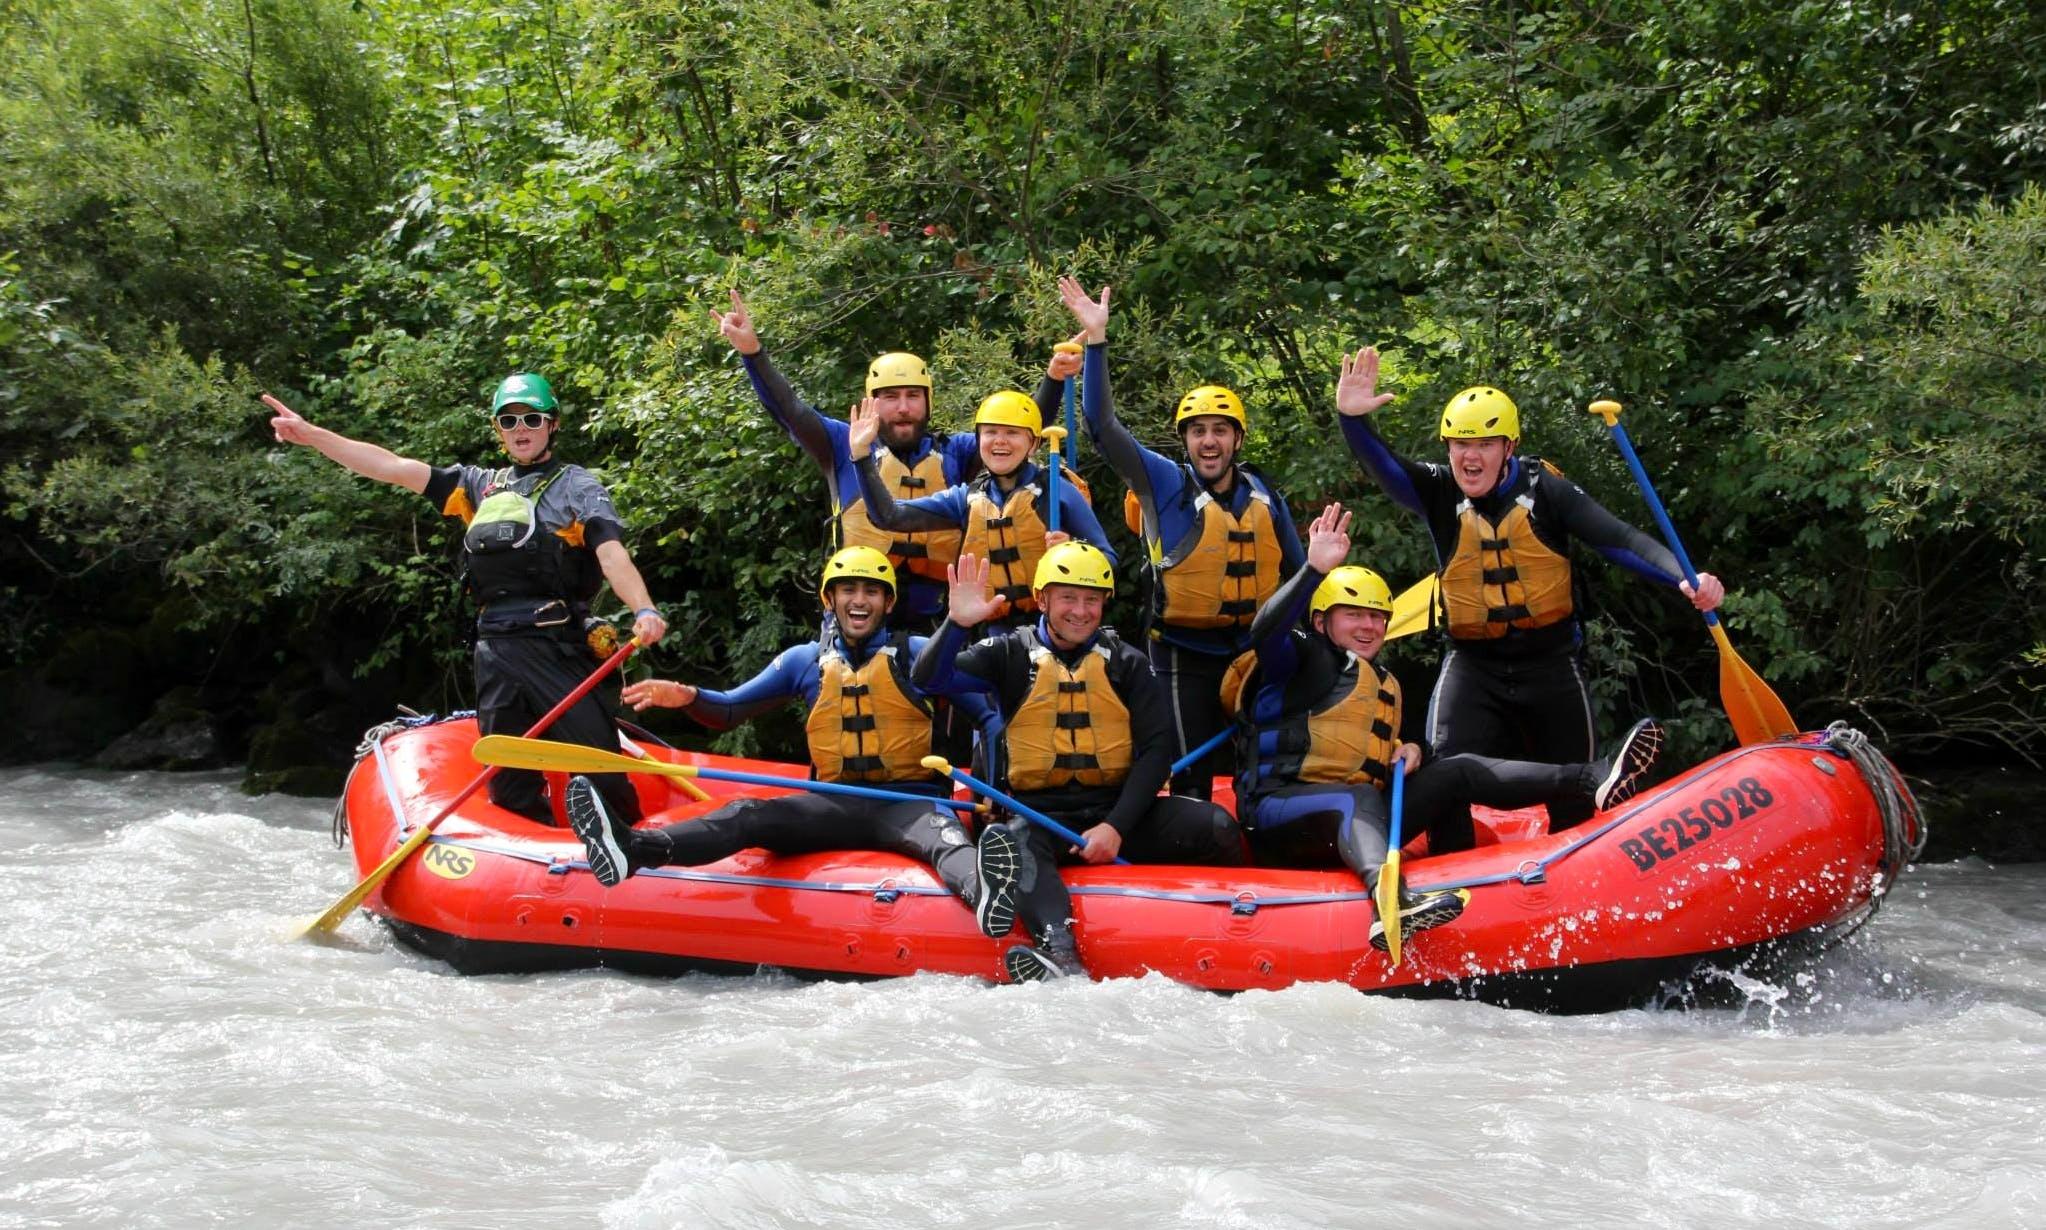 White Water Rafting Trips in Matten bei Interlaken